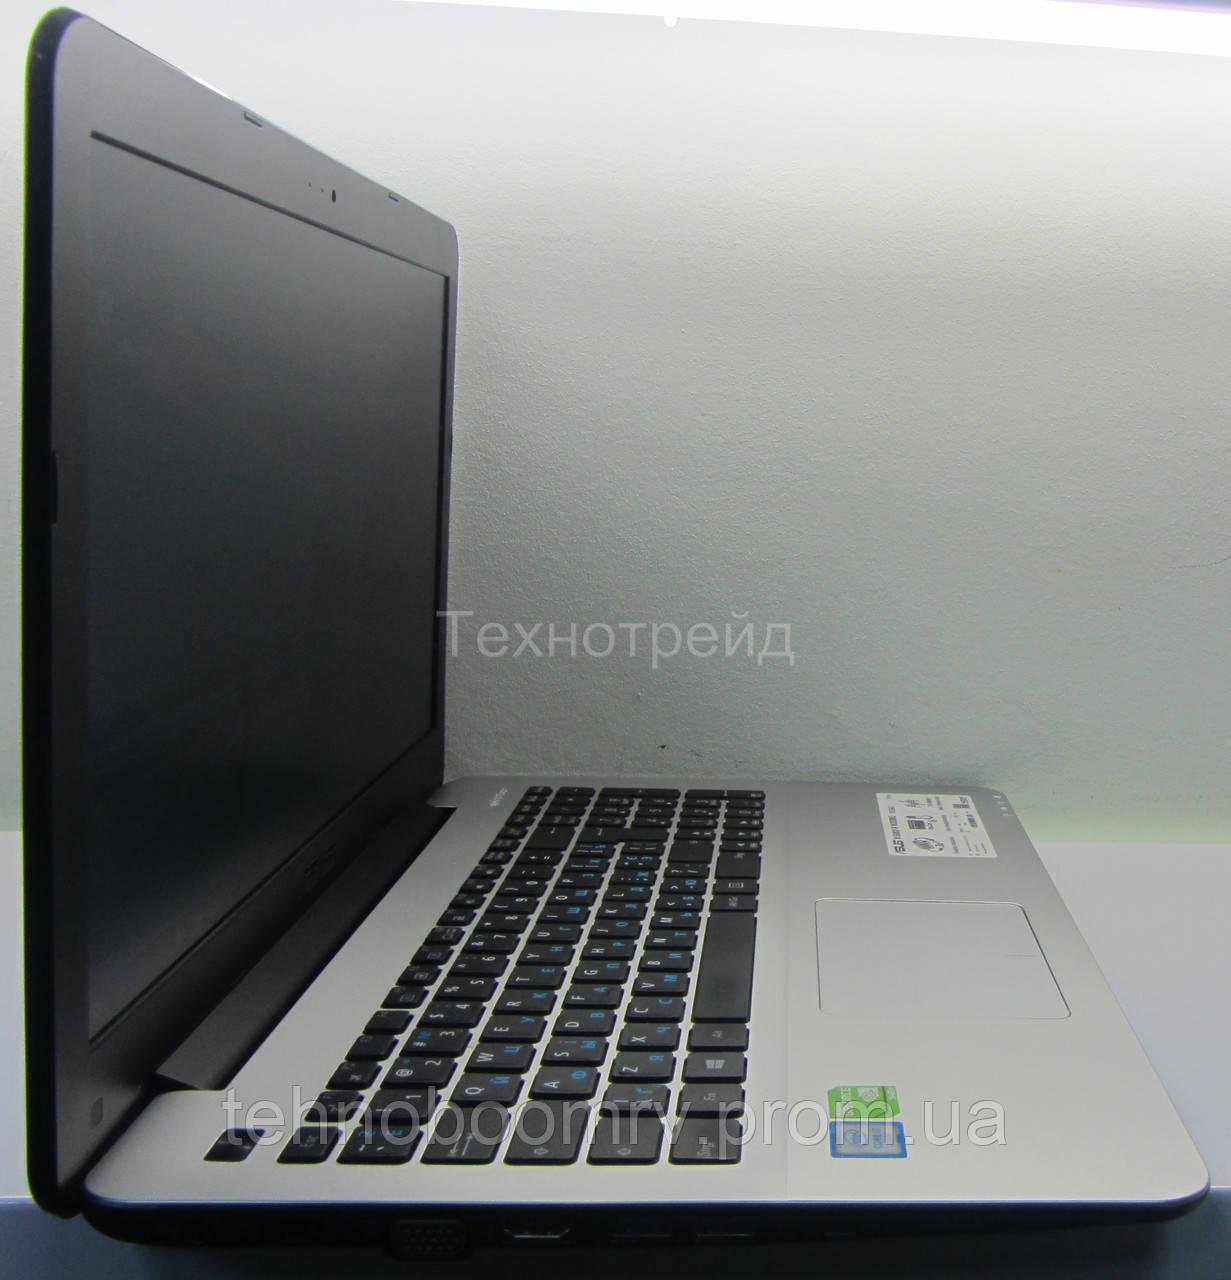 Asus R556U - Intel i7-6500U 3.1GHz/DDR3 8GB/nVidia GT 940M 2GB 2